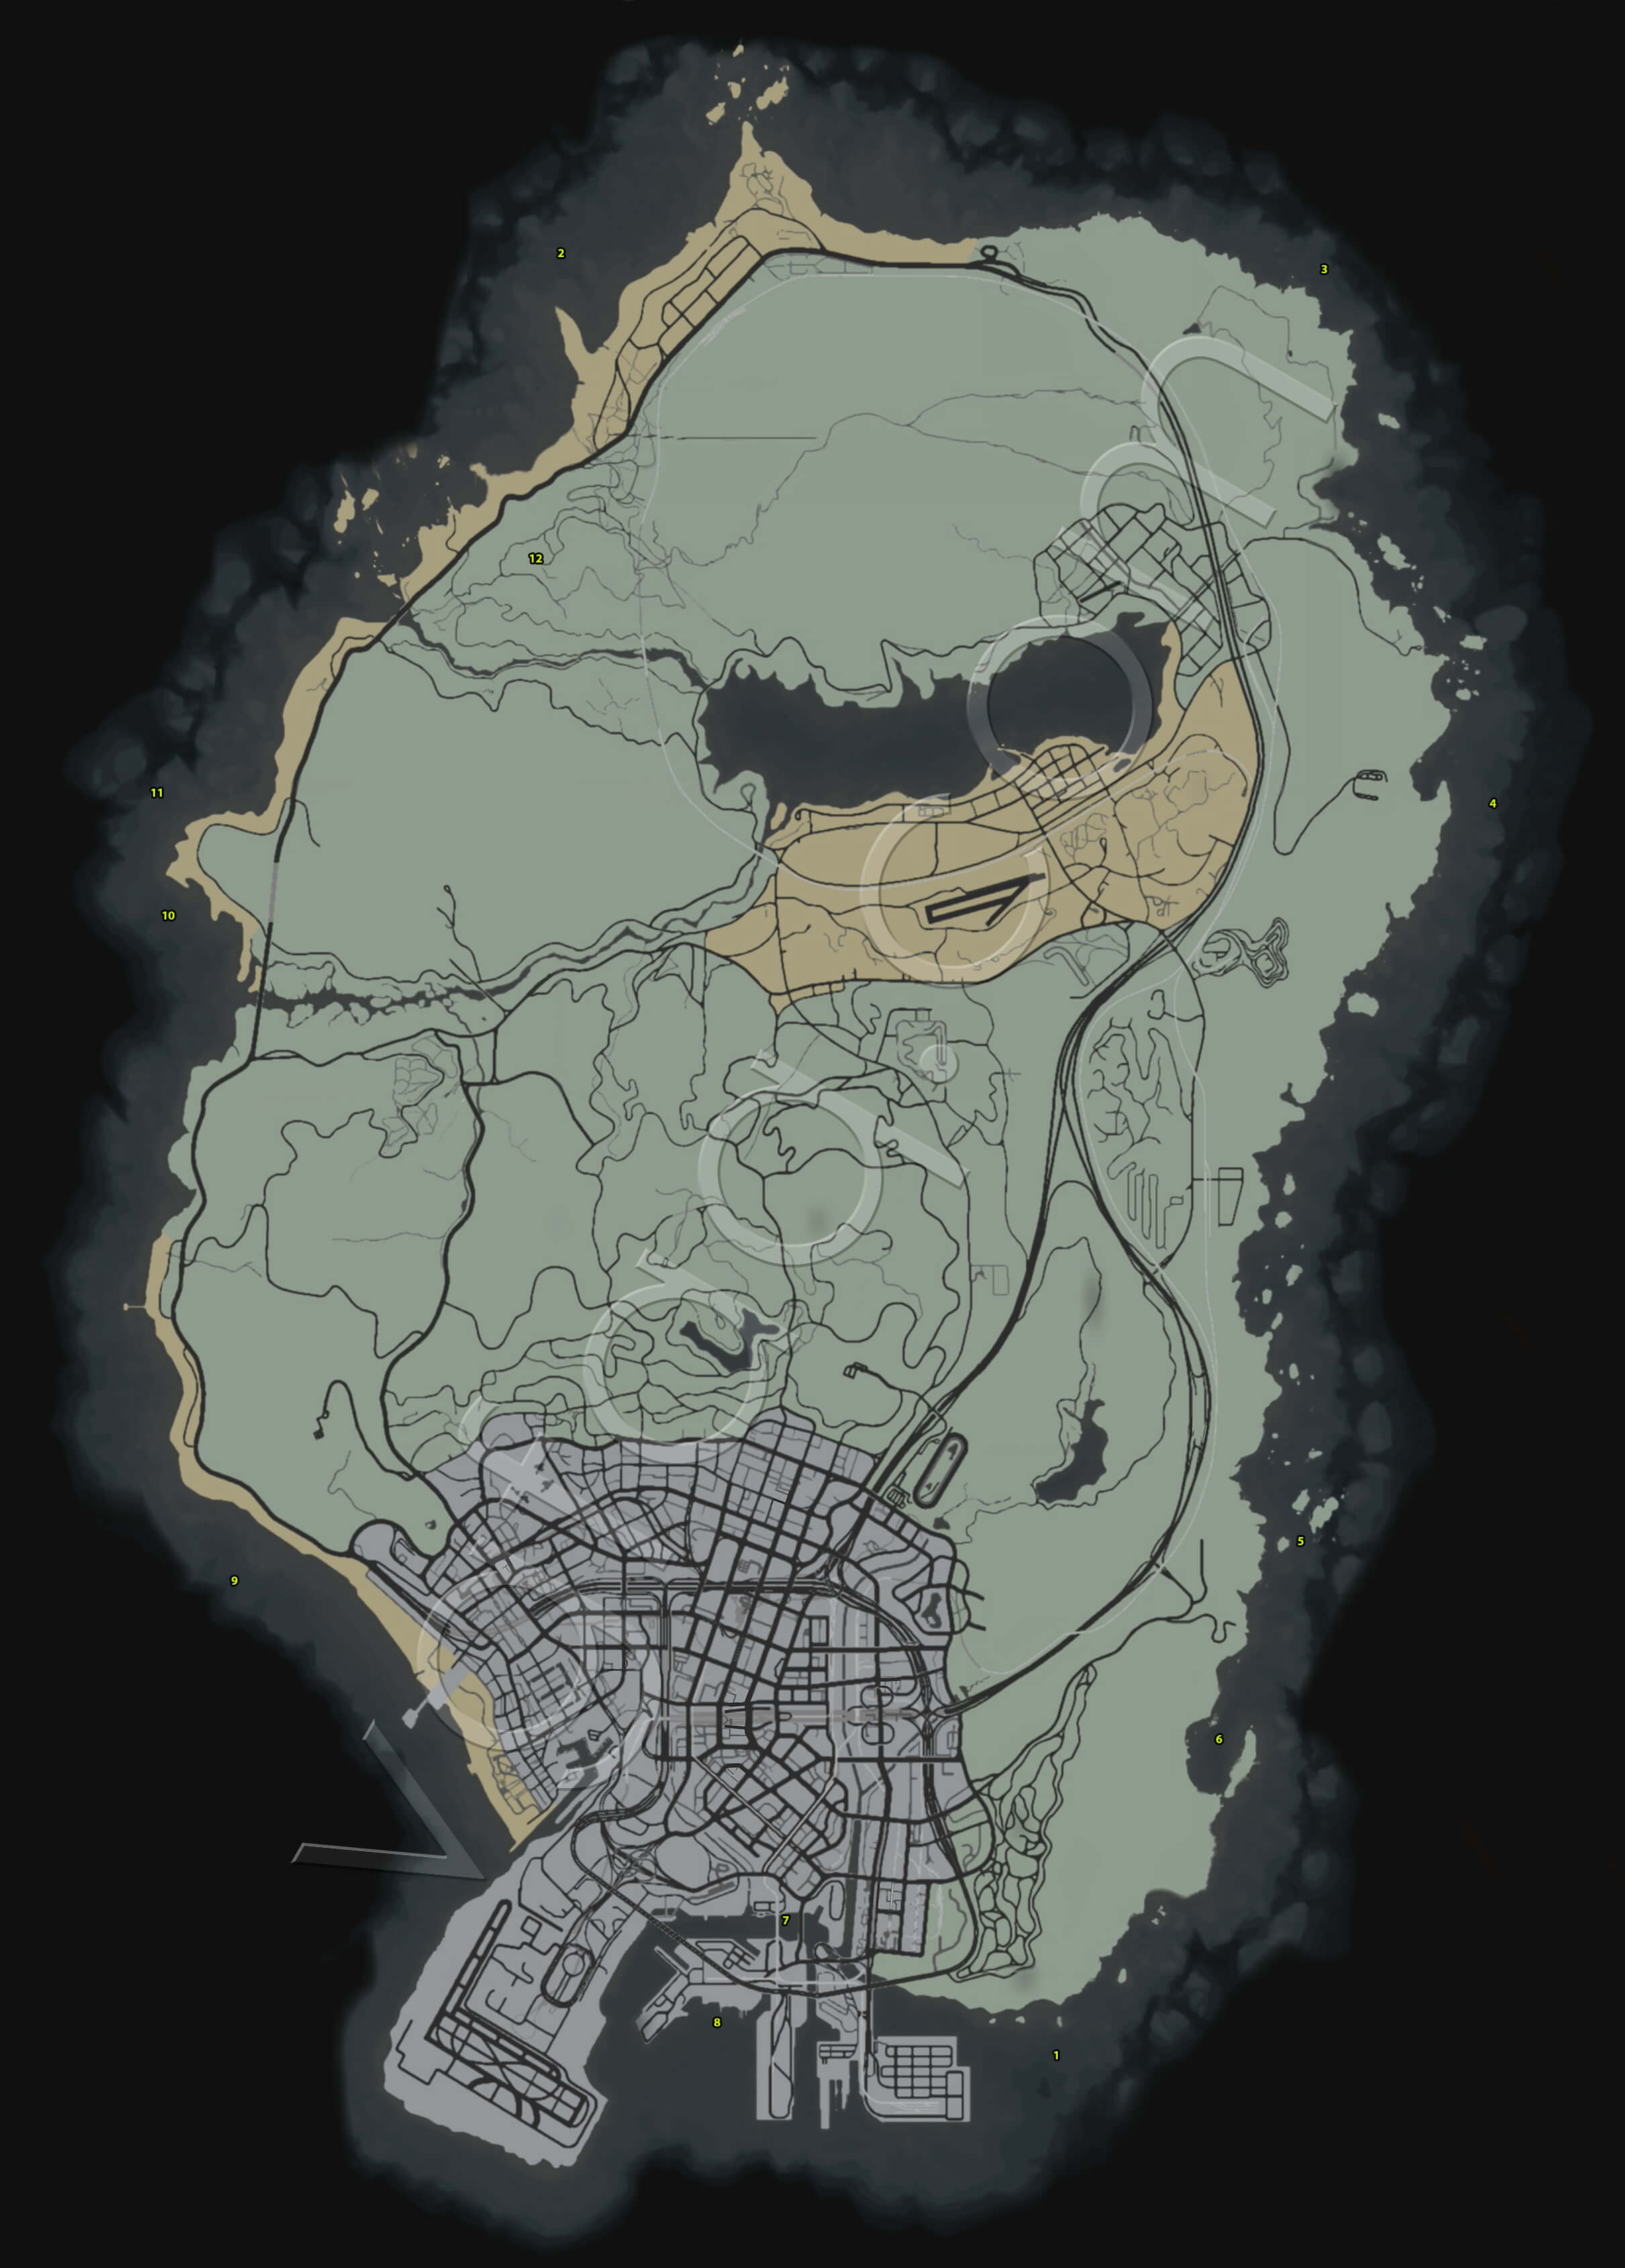 hidden locations theft grand auto packages gta map guide briefcase random vgfaq porch